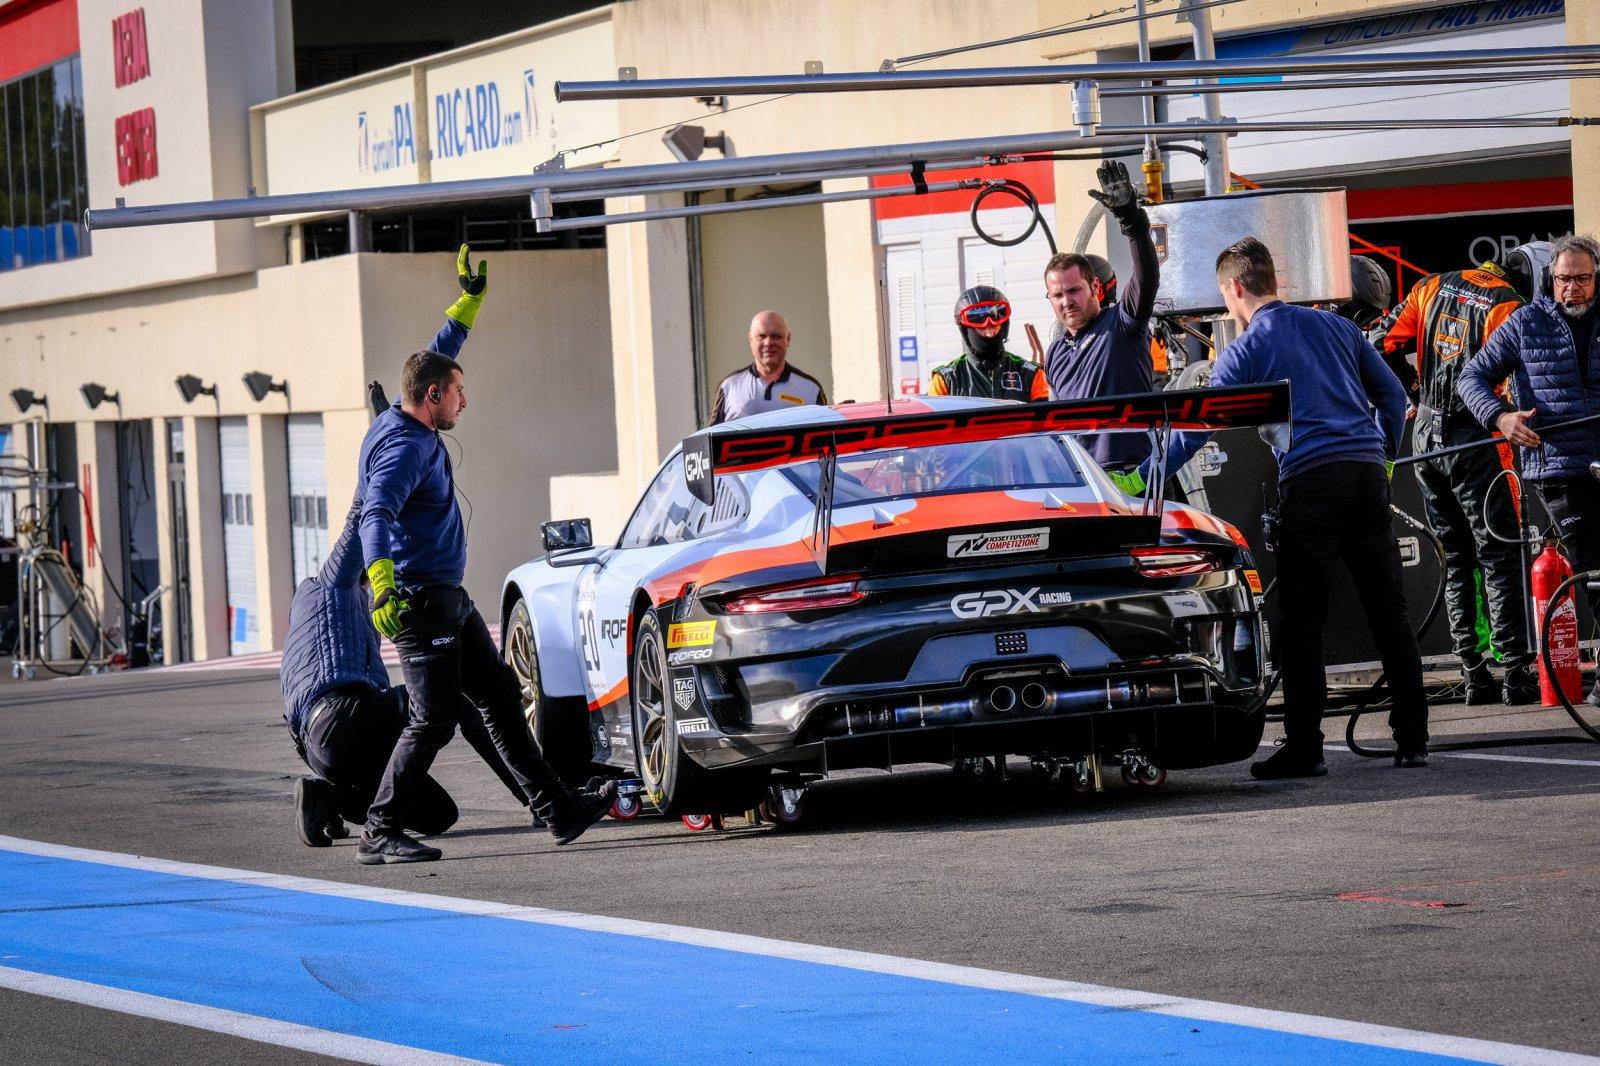 #20 GPX Racing UAE Porsche 911 GT3 R, Pitlane